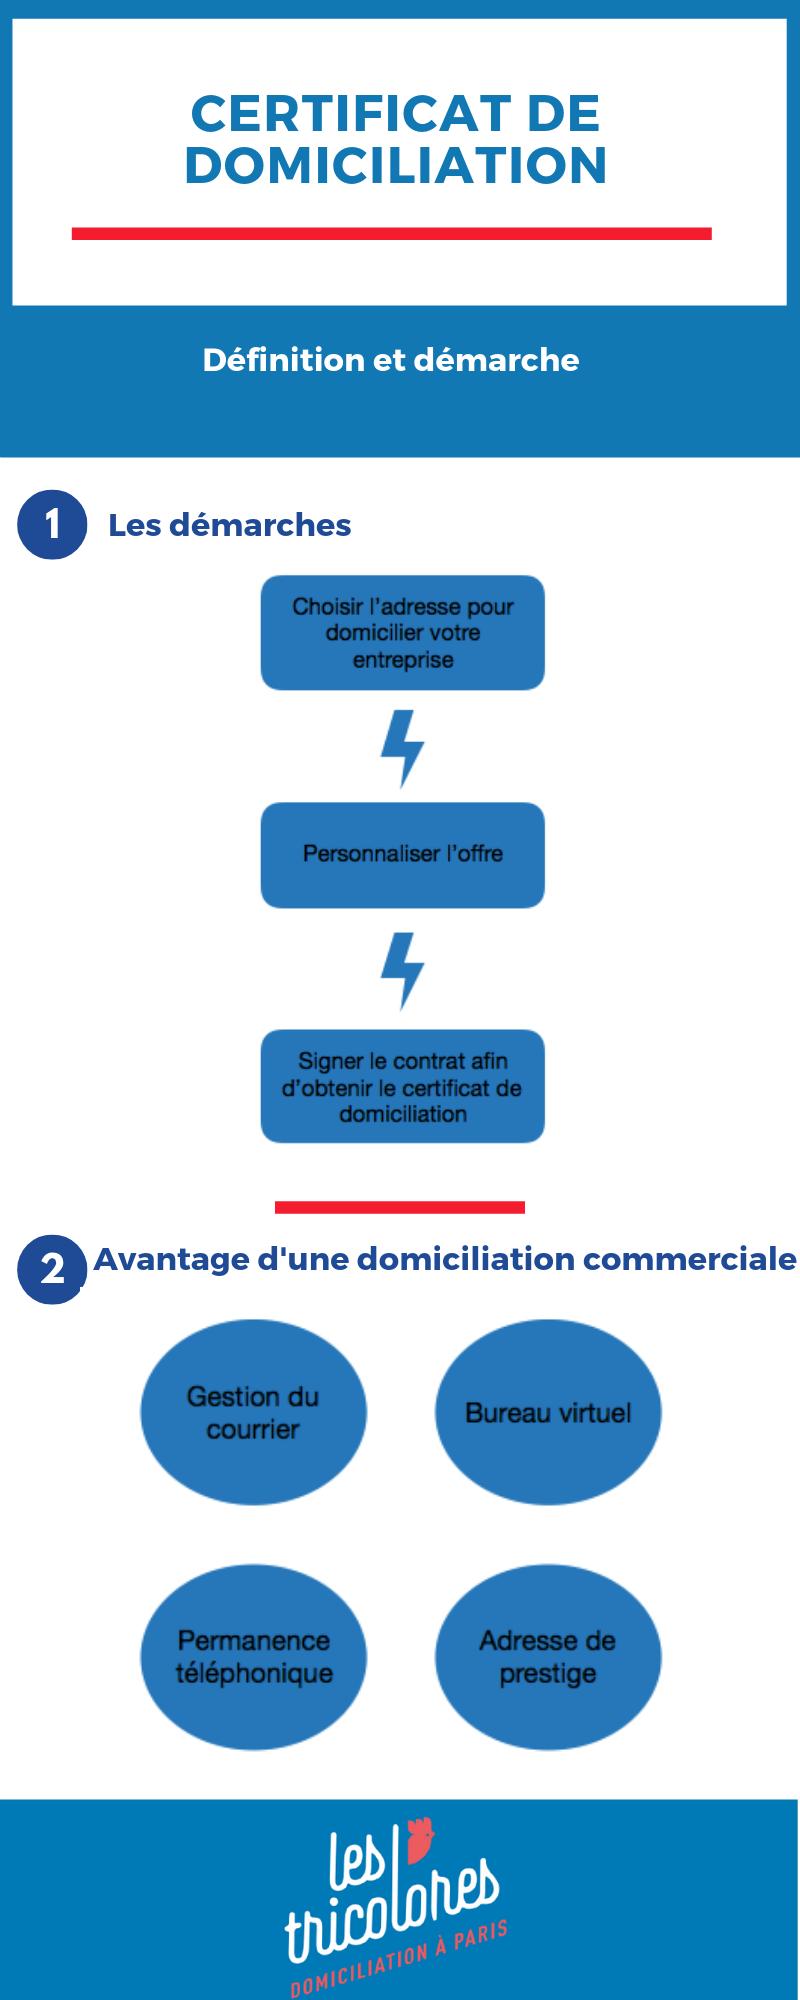 Certification de domiciliation